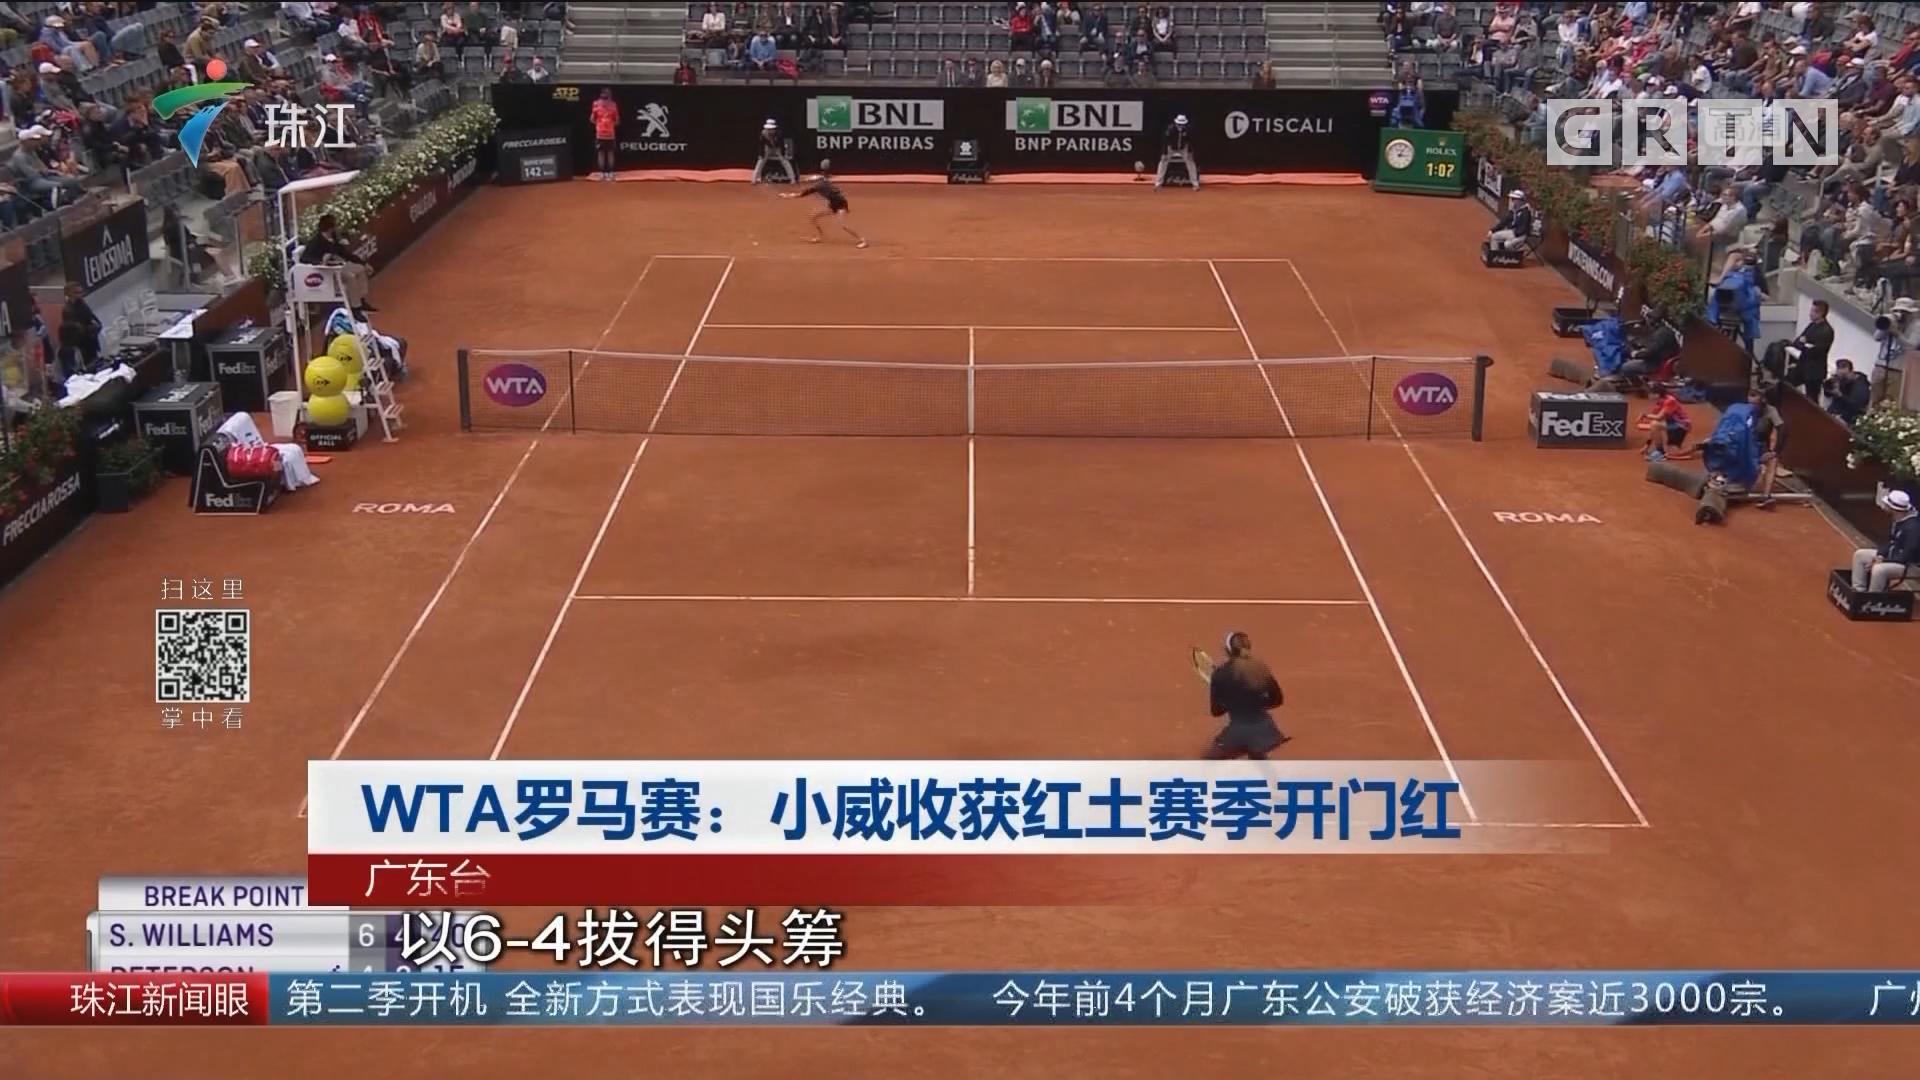 WTA罗马赛:小威收获红土赛季开门红